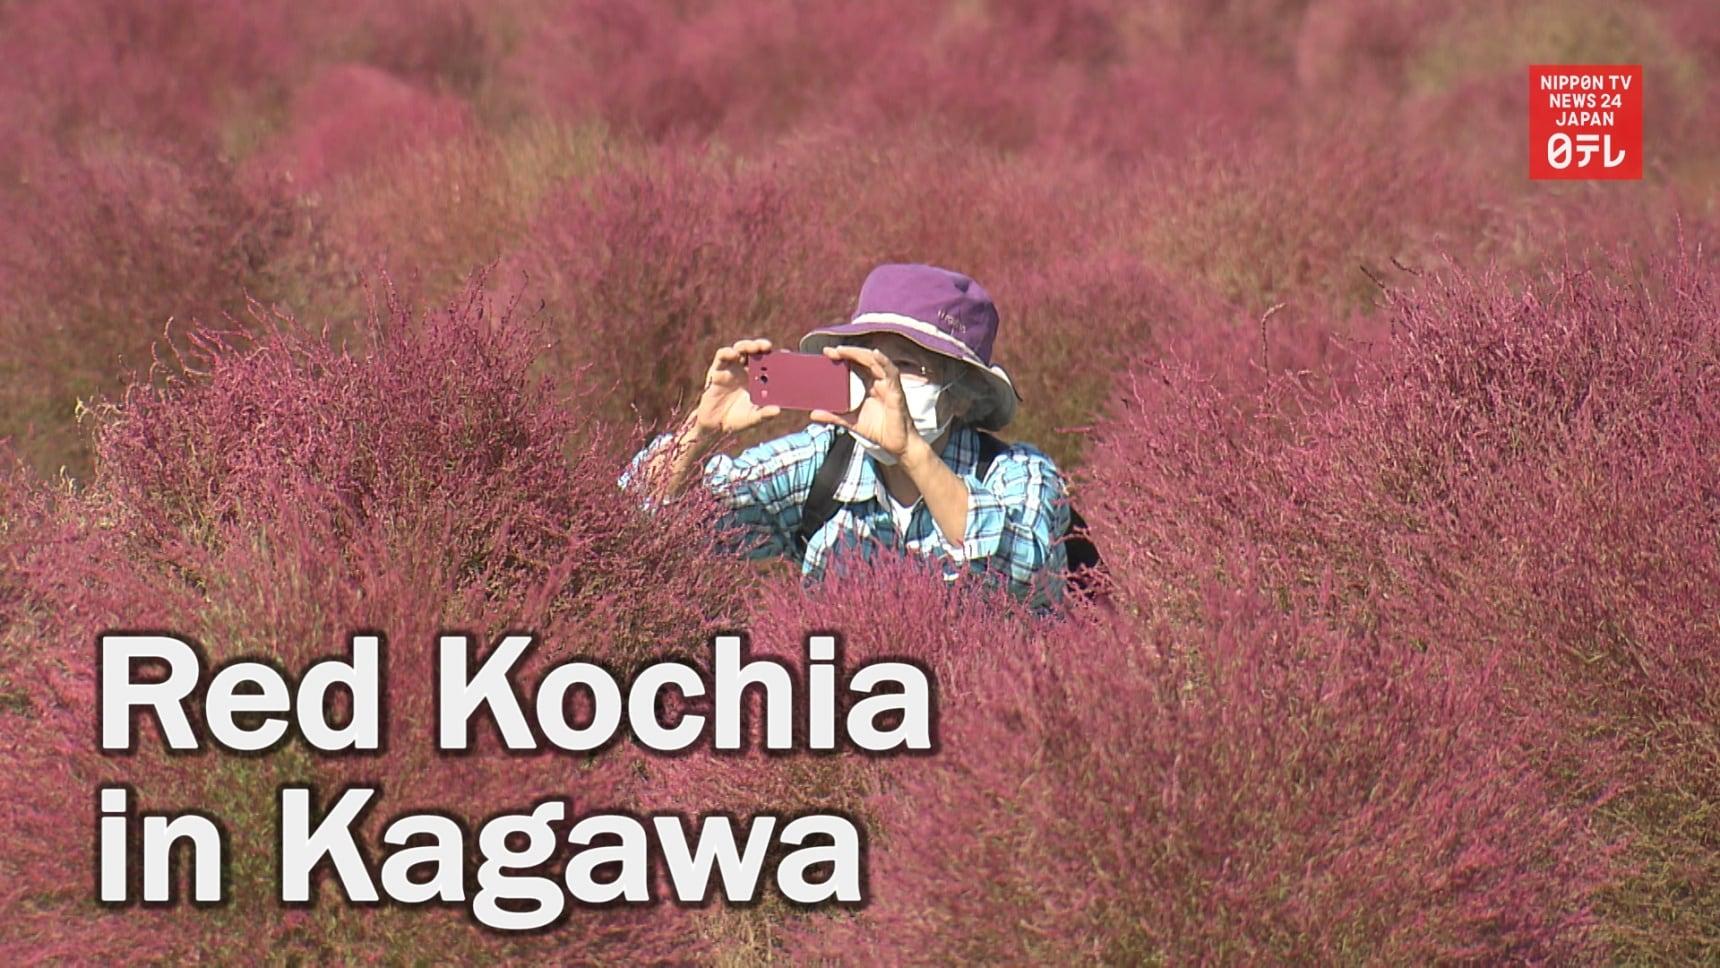 Red Kochia Are Attracting Visitors to Kagawa